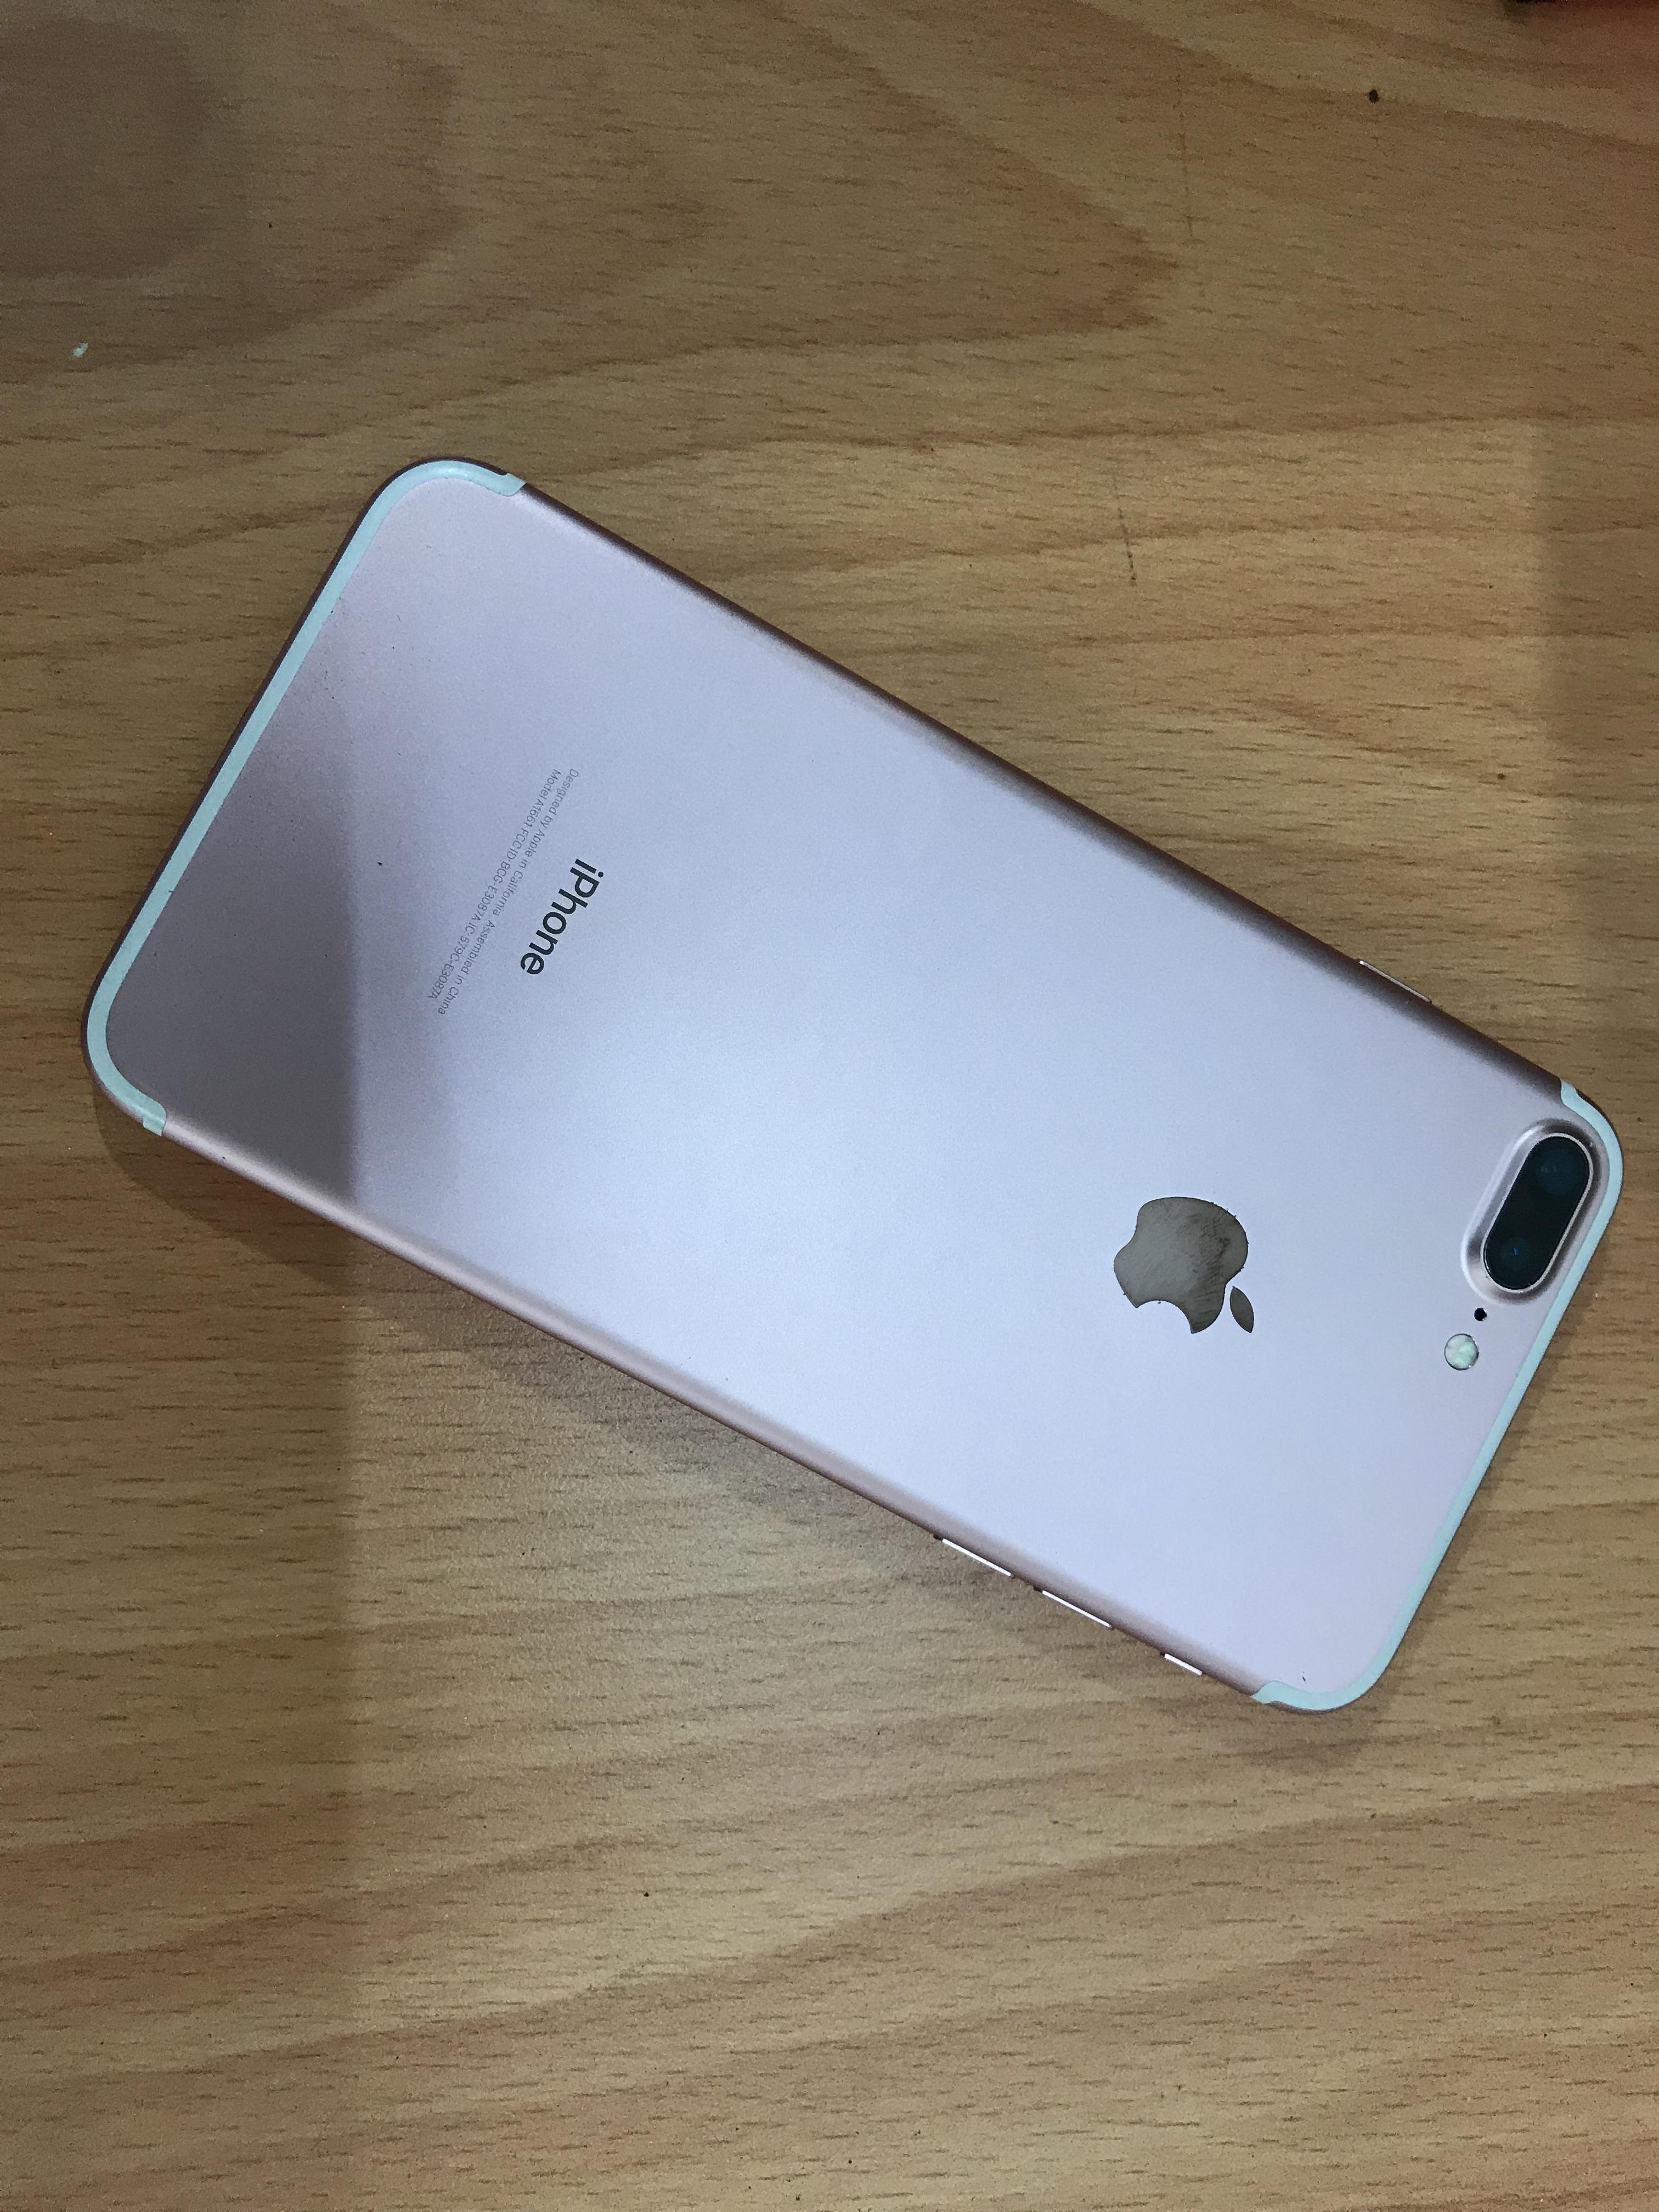 1 IPhone 7 plus 128gb hồng mới 99,9999 quốc tế